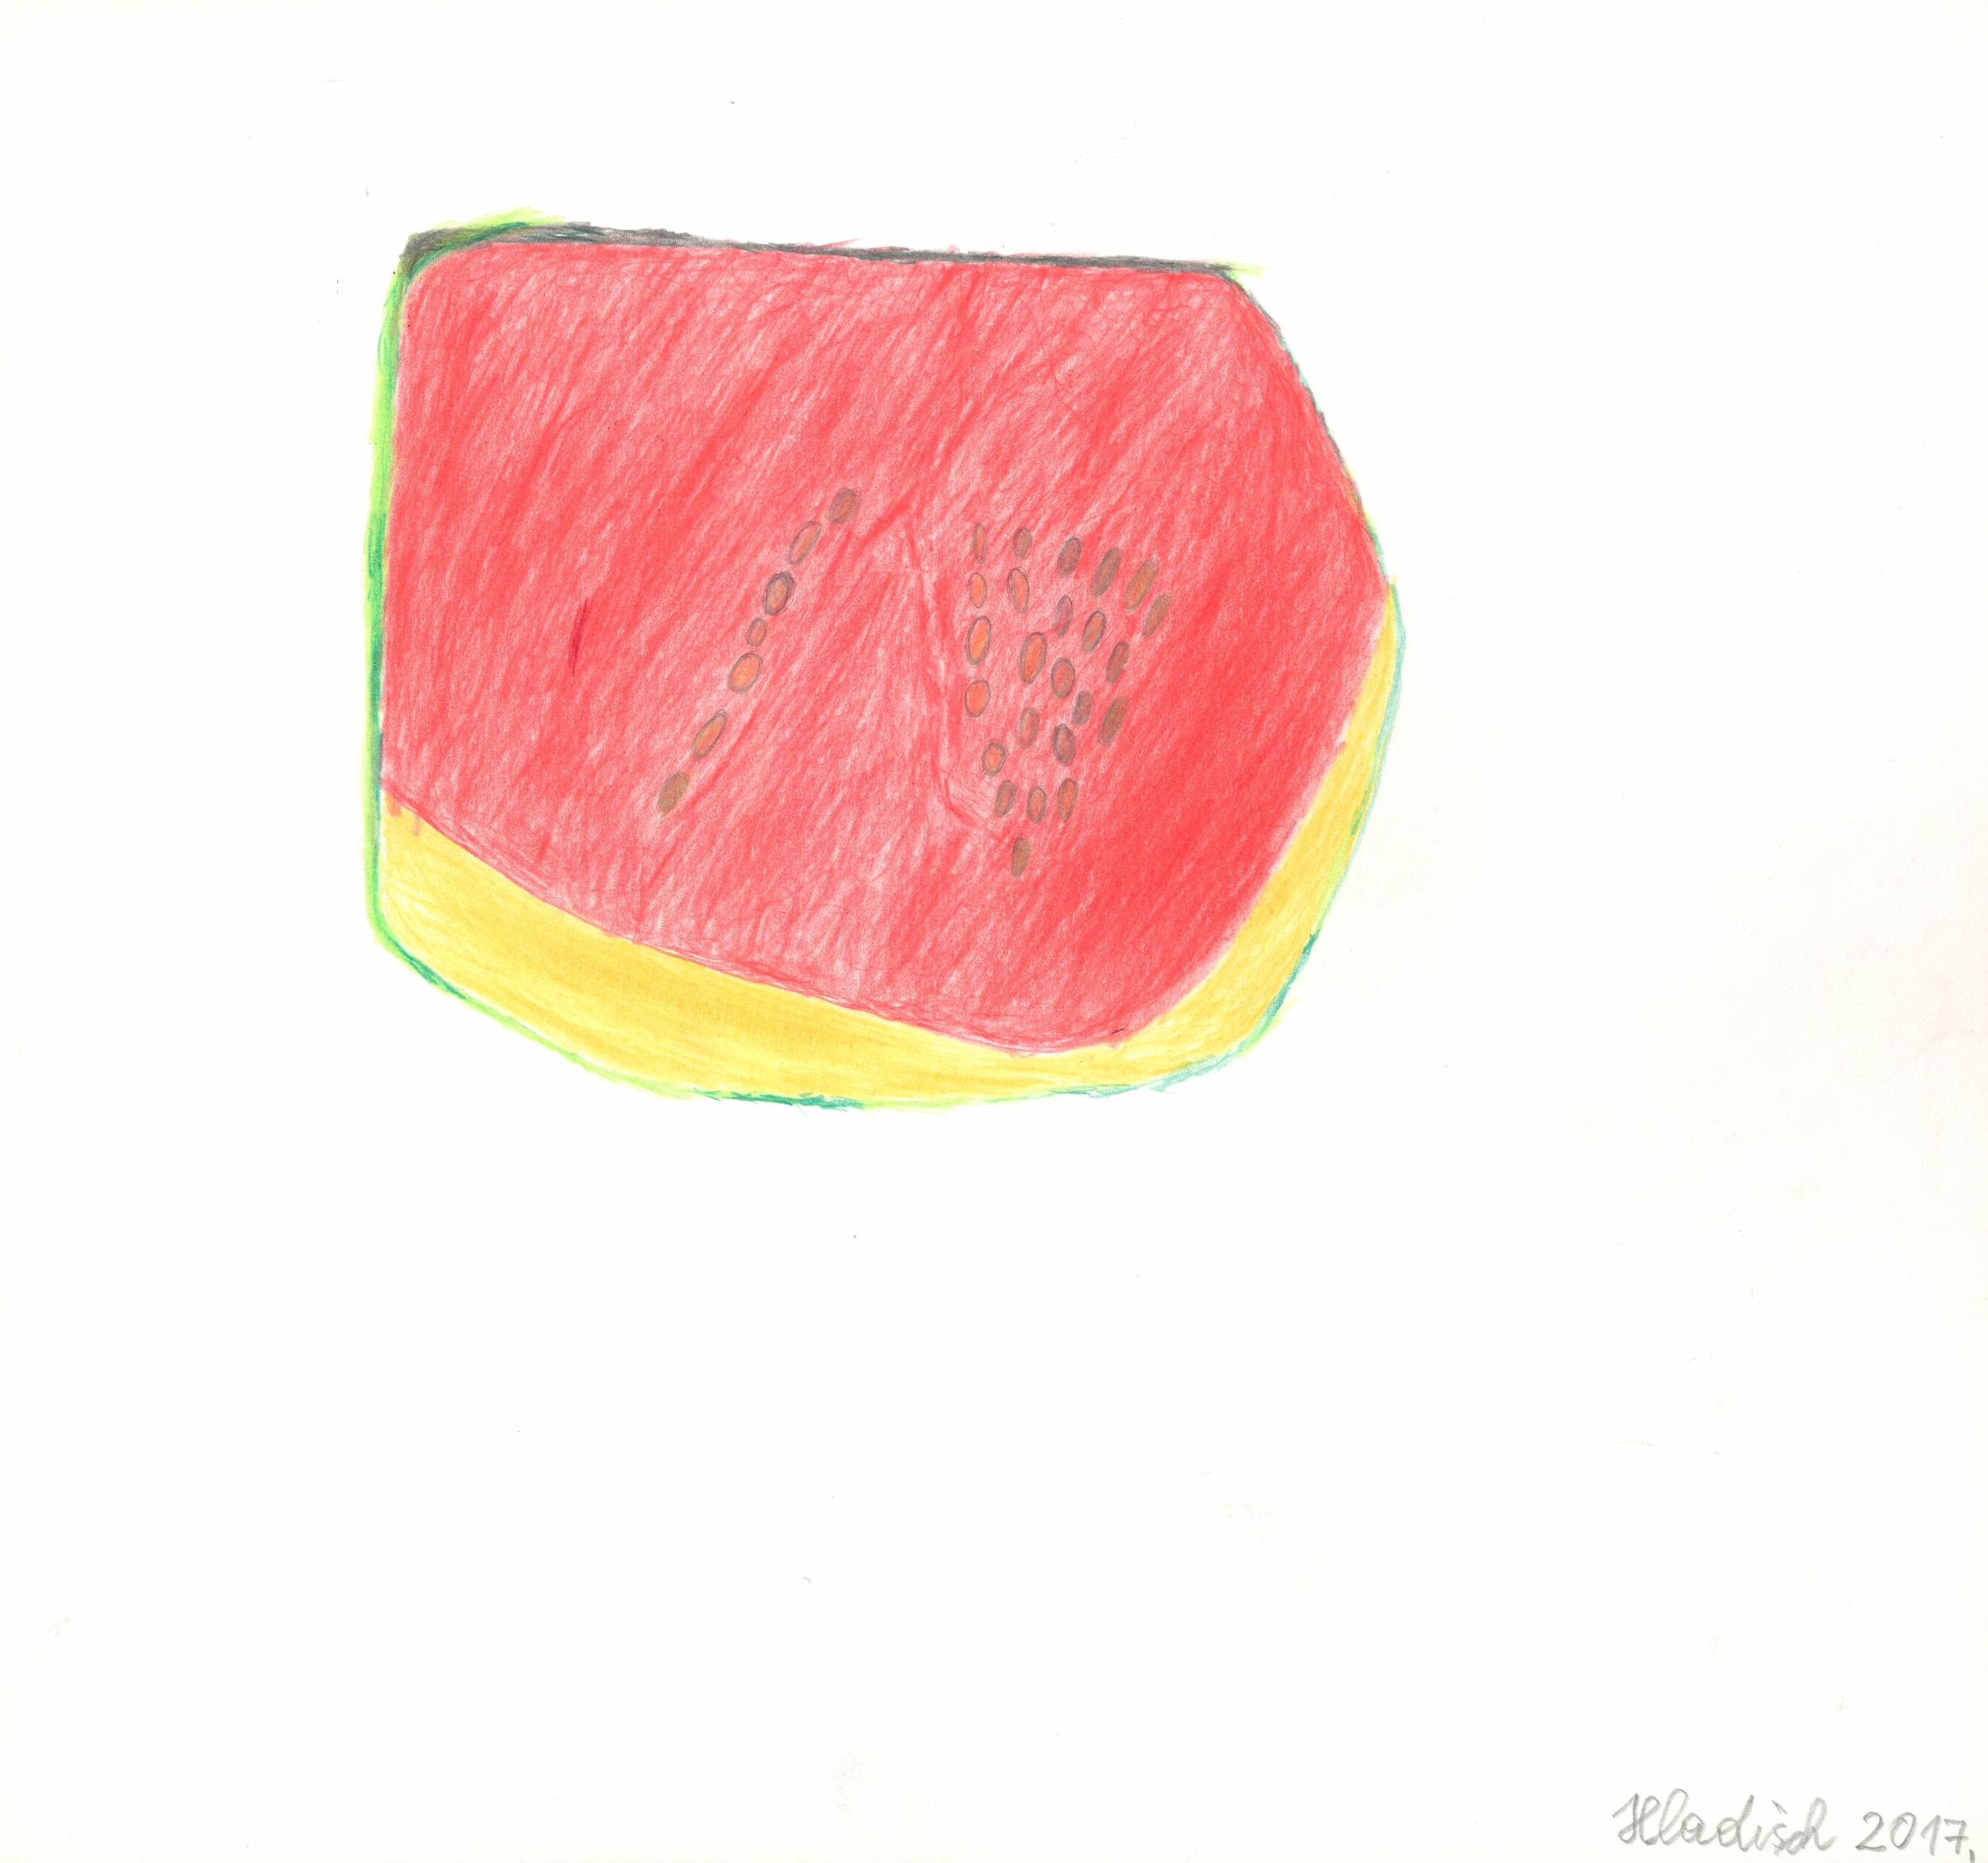 hladisch helmut - Melone / Melon